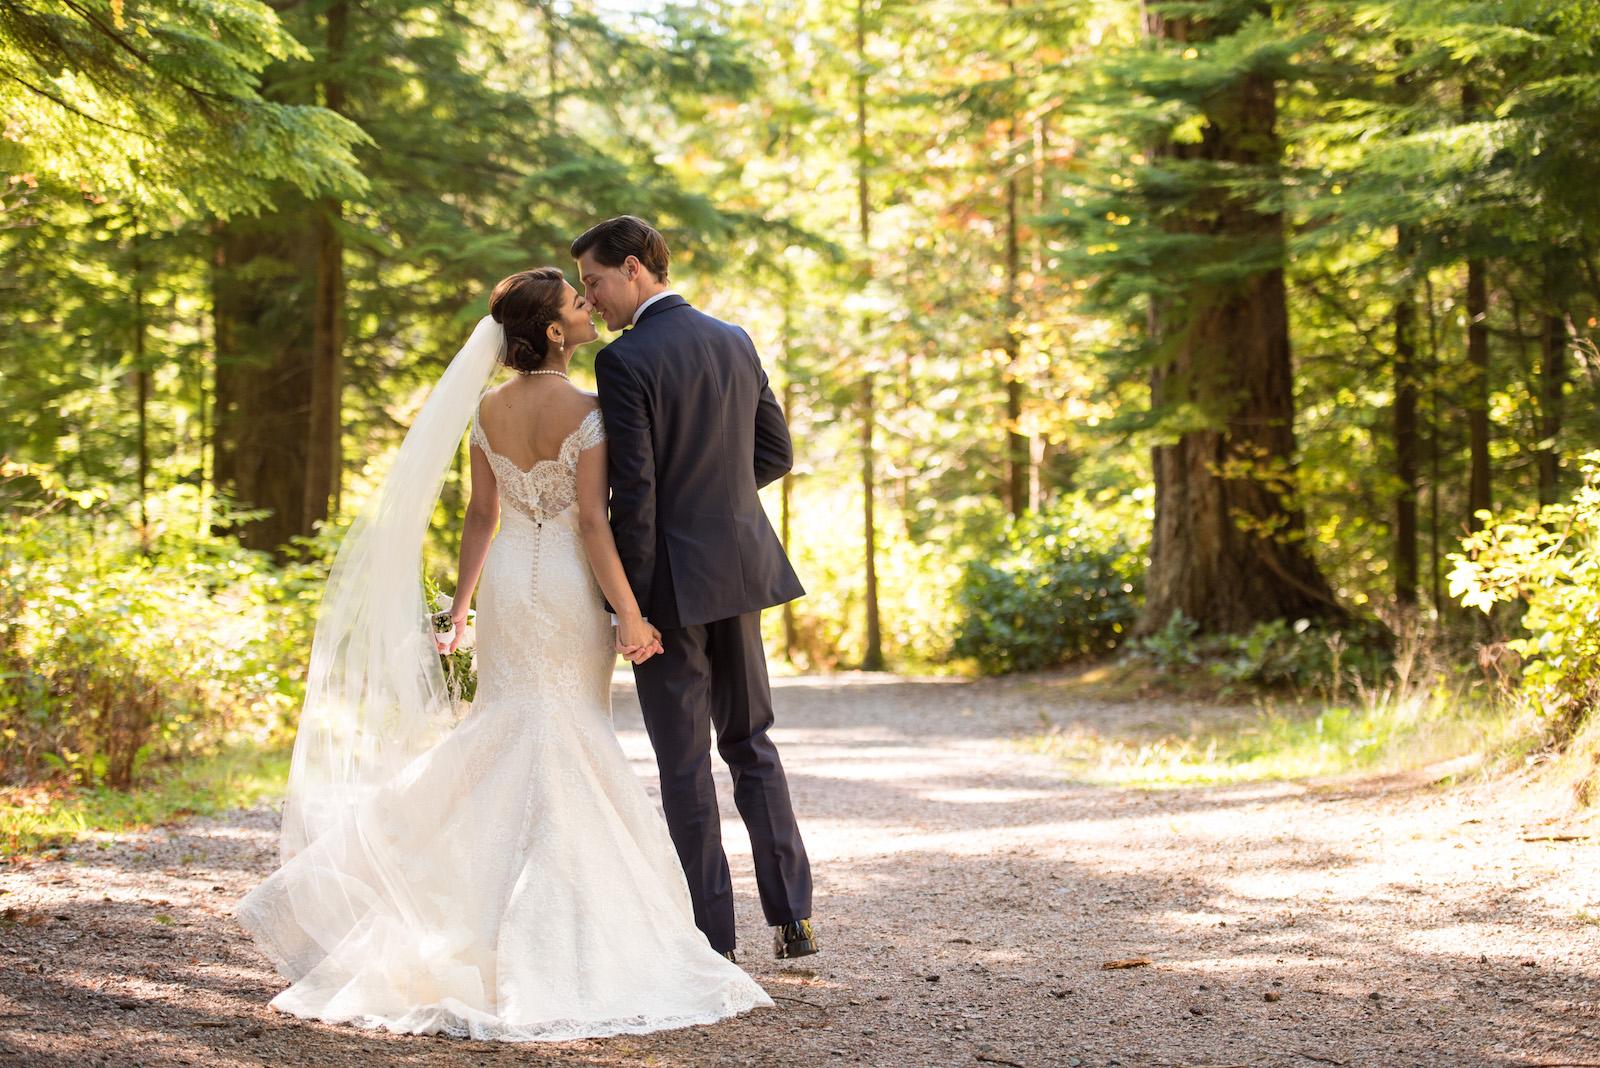 victoria-wedding-photographers-fairmont-pacific-rim-wedding-29.jpg